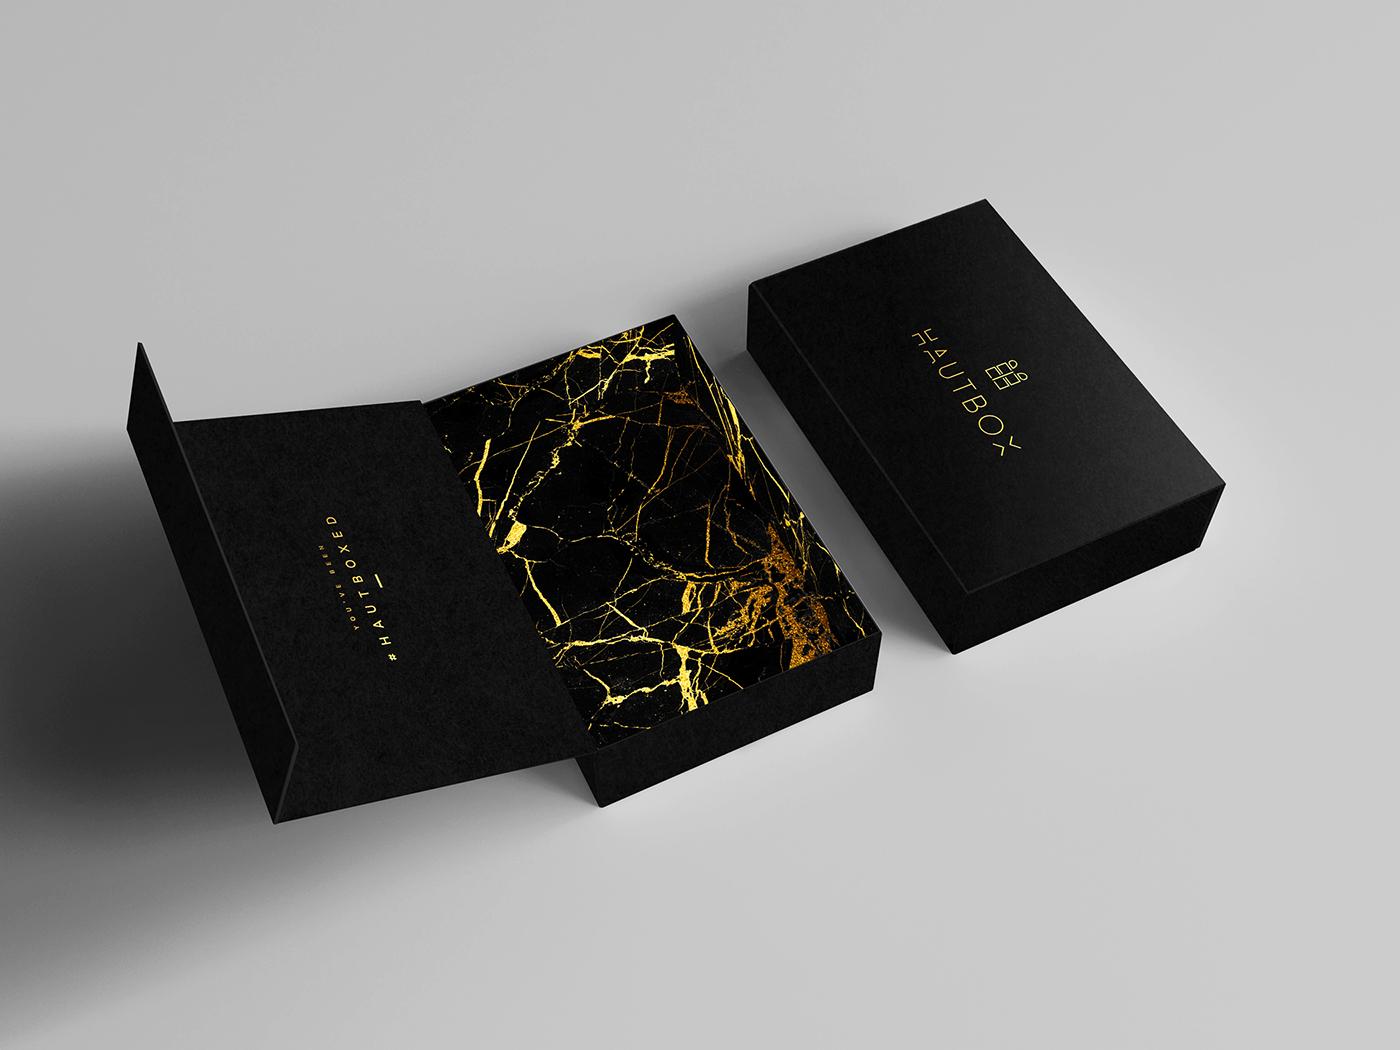 brand identity packaging design luxury packaging luxury brand gold packaging Marble gold foil Brand Design chic fashion brand